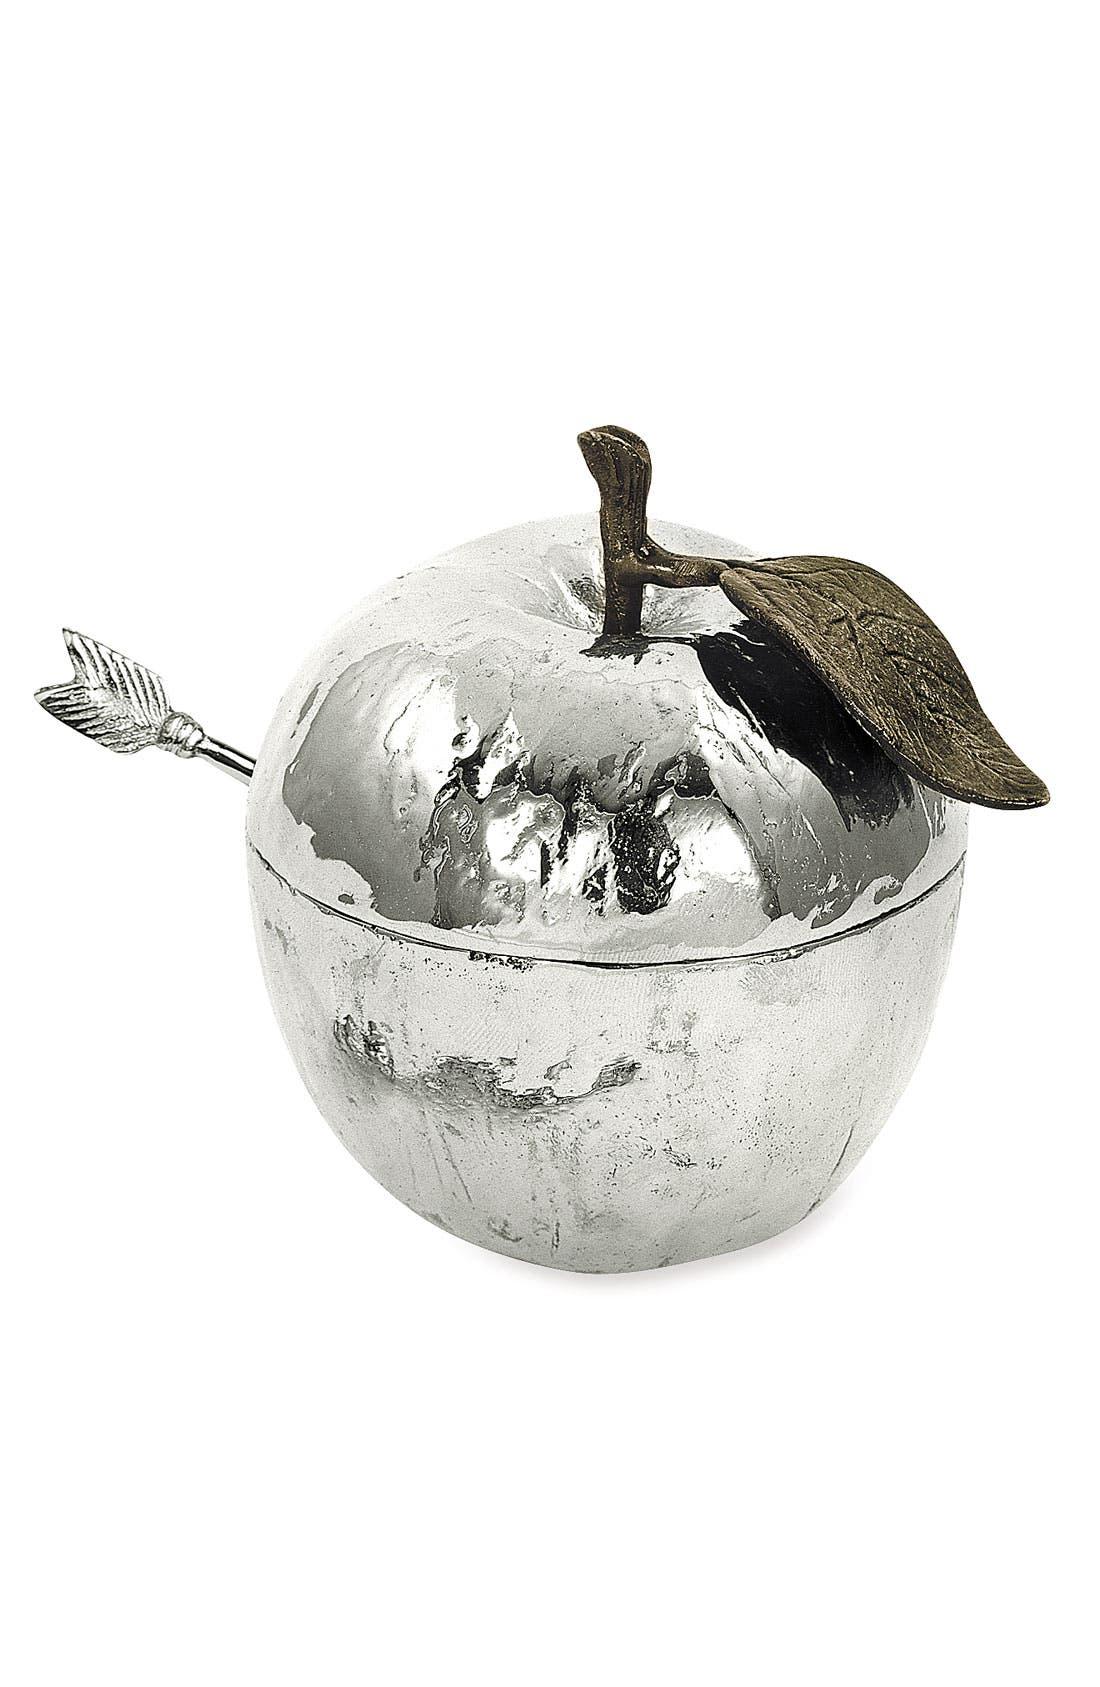 Main Image - Michael Aram 'Apple' Honey Pot with Spoon